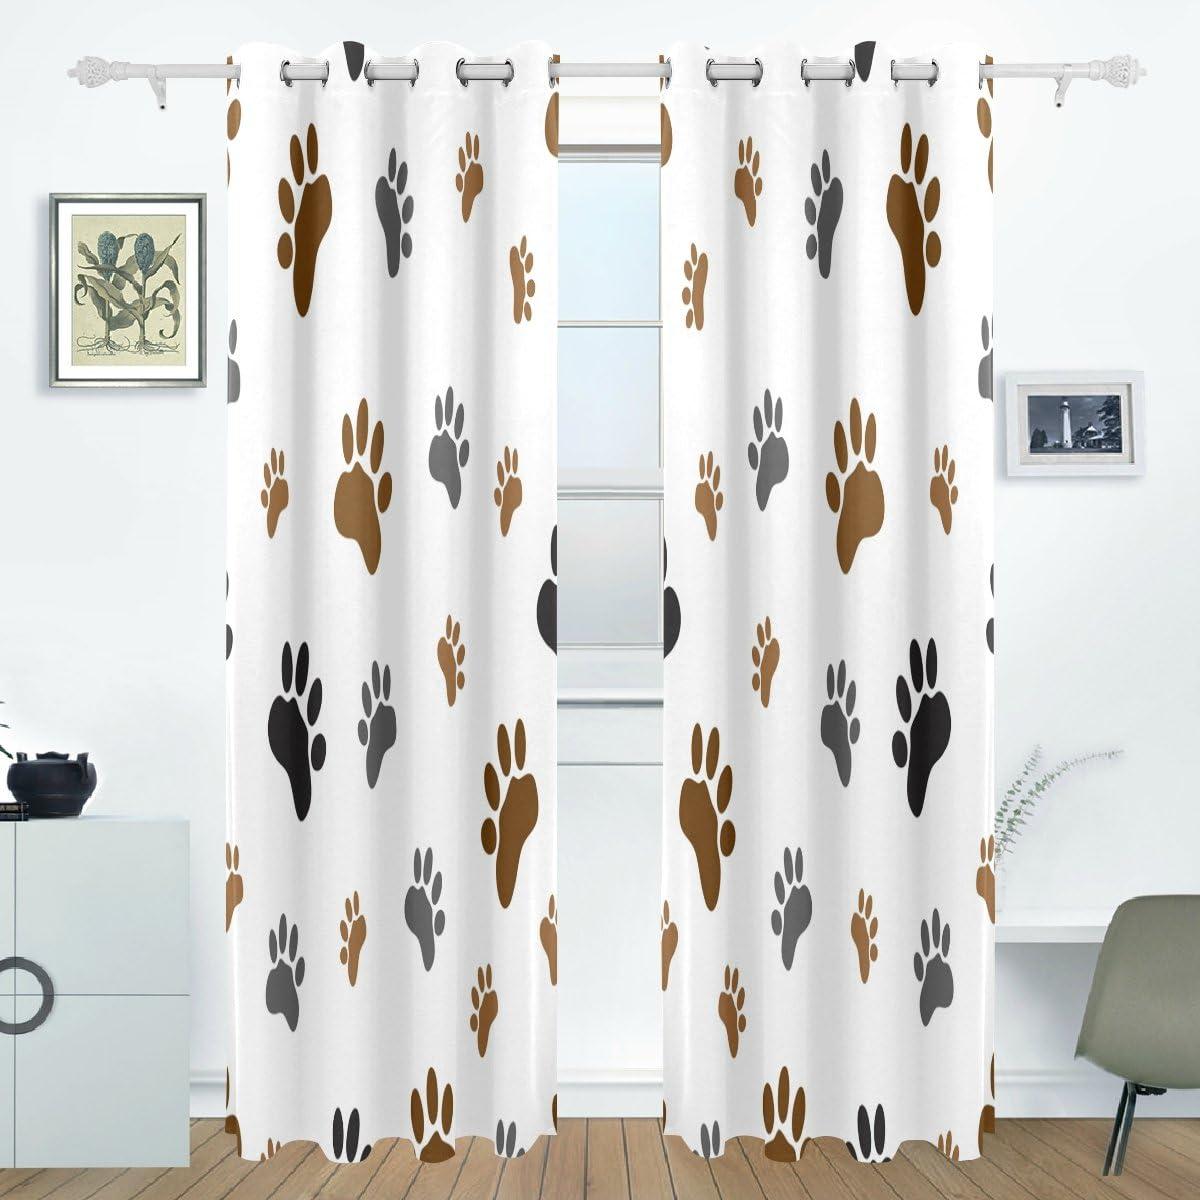 WOZO Animal Dog Paw Print Window Curtain Panels Drape 84 x 55 Inches, 2-Piece Blackout Room Darkening Curtains Window Panel for Living Room Bedroom